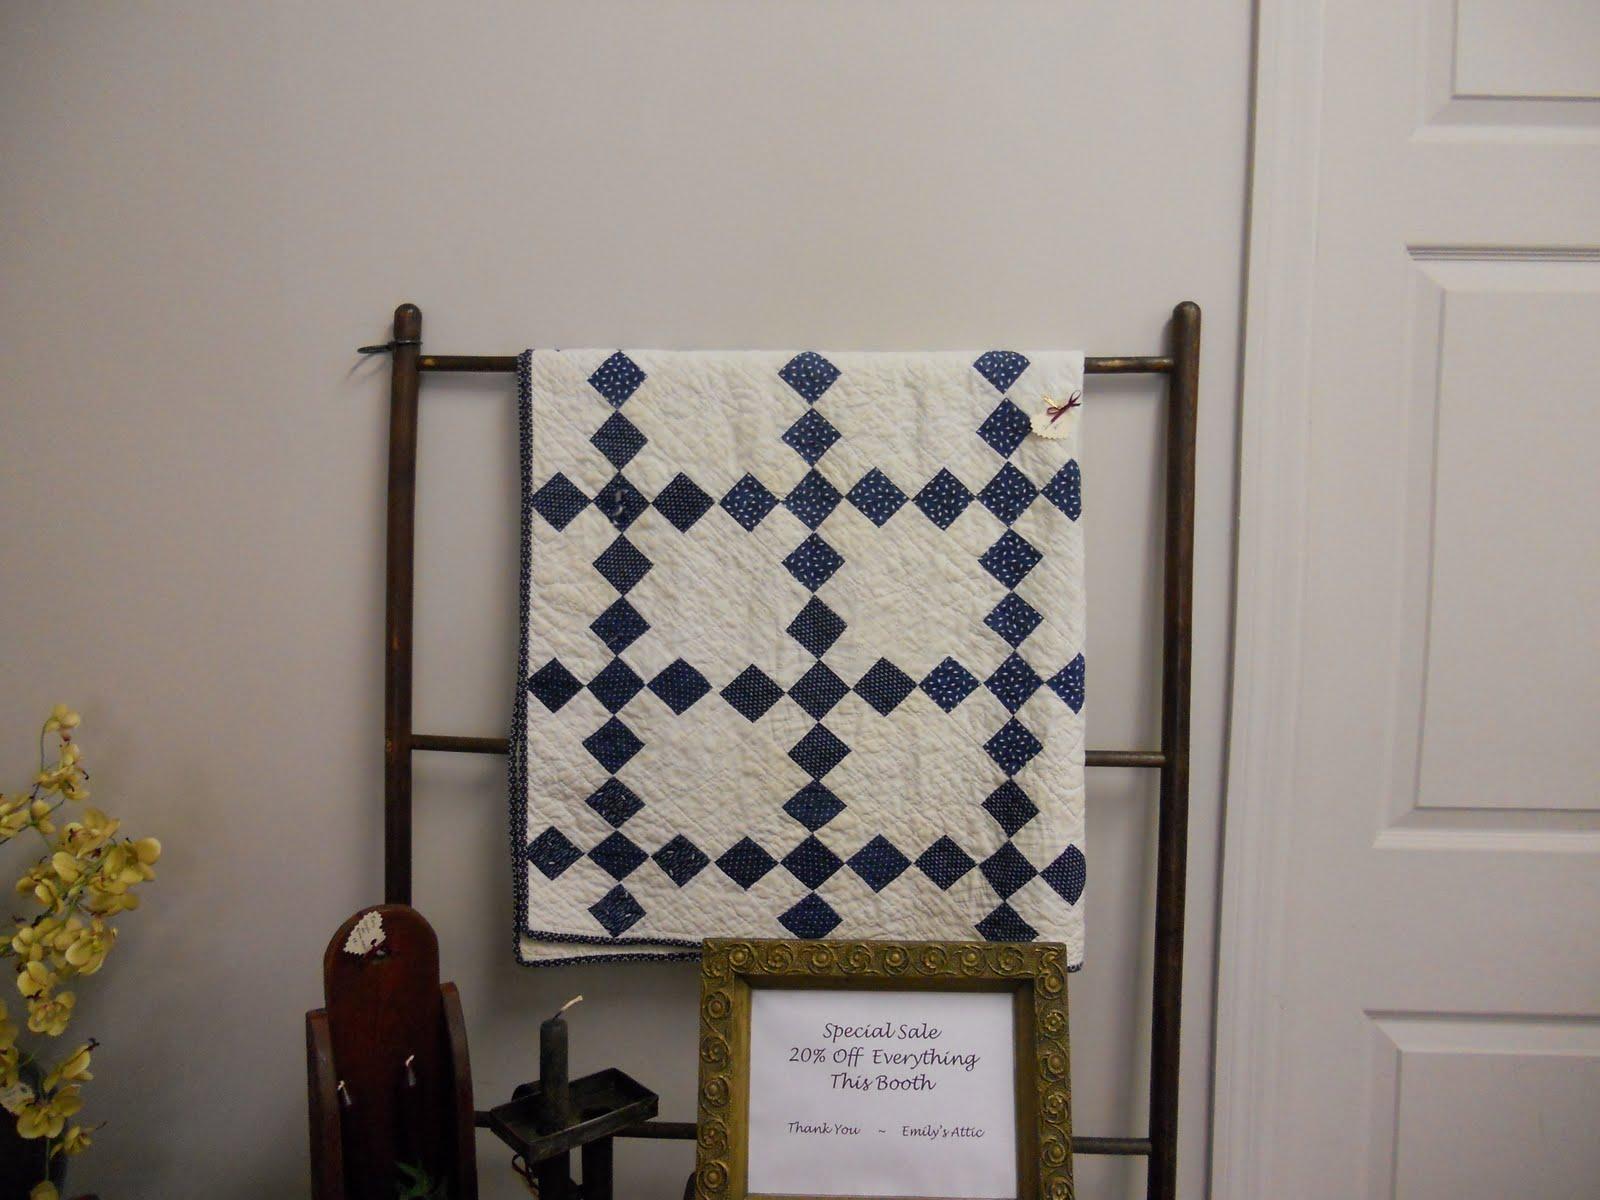 Antique pinwheel quilt dating 7